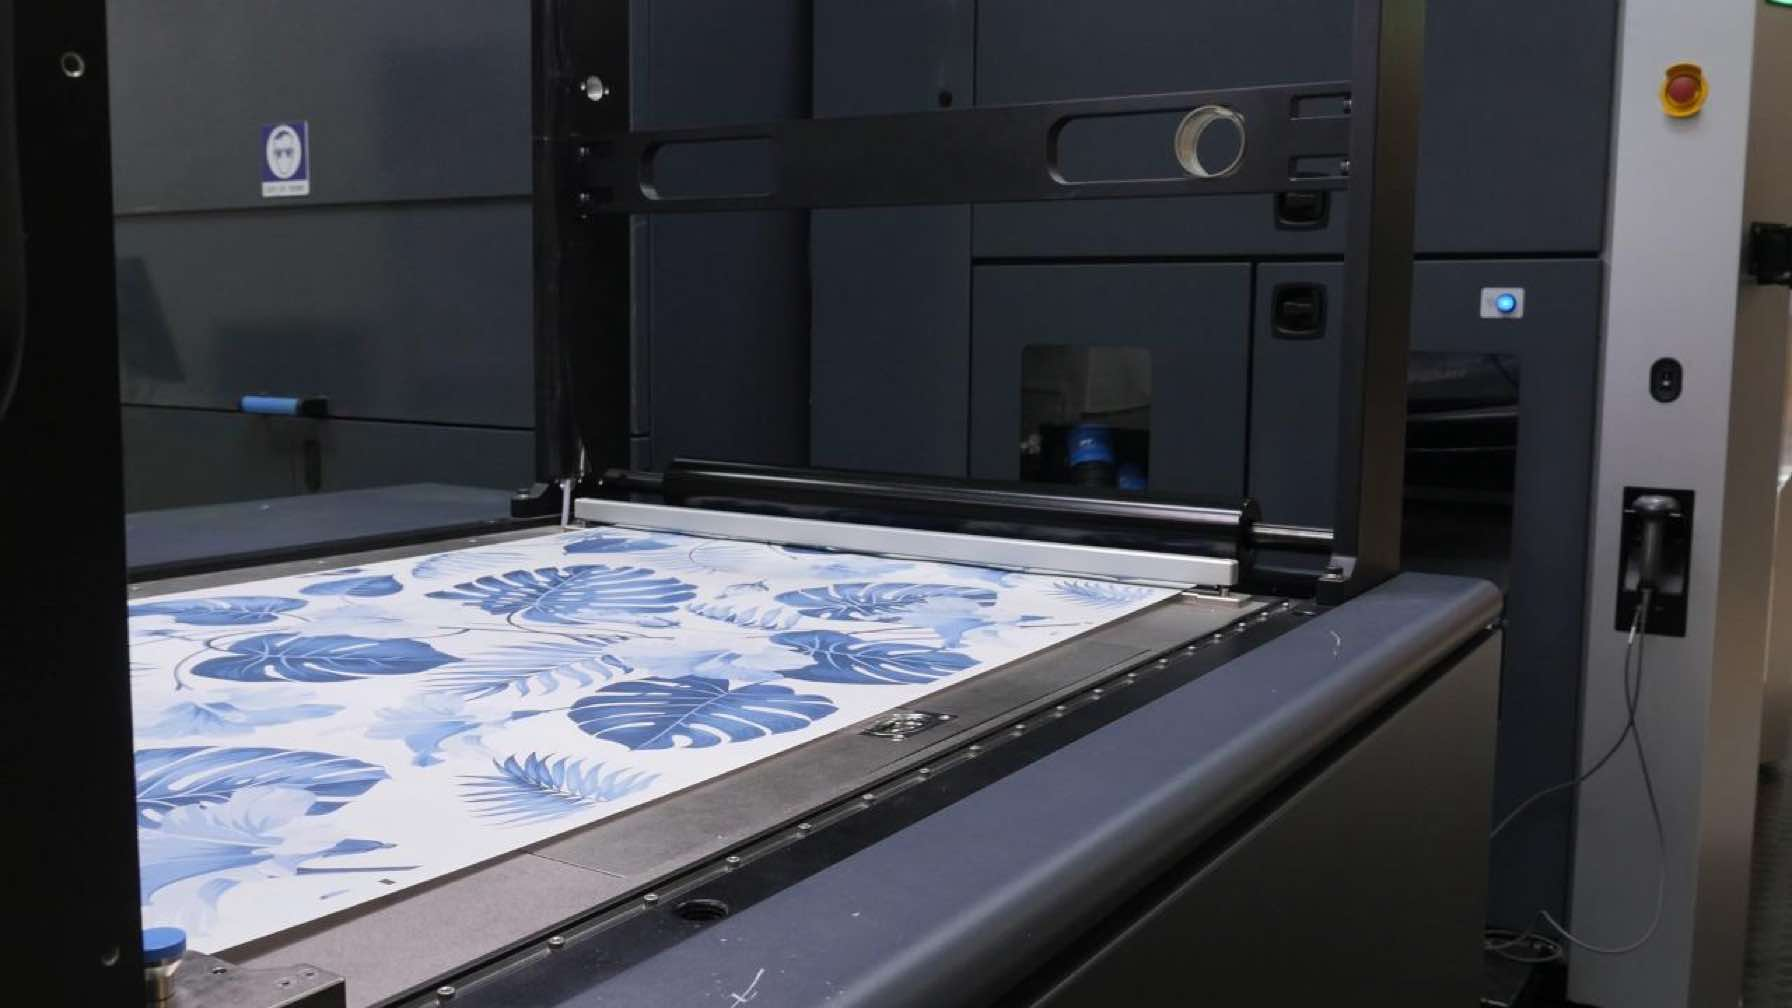 HP Indigo printer and designed canvas